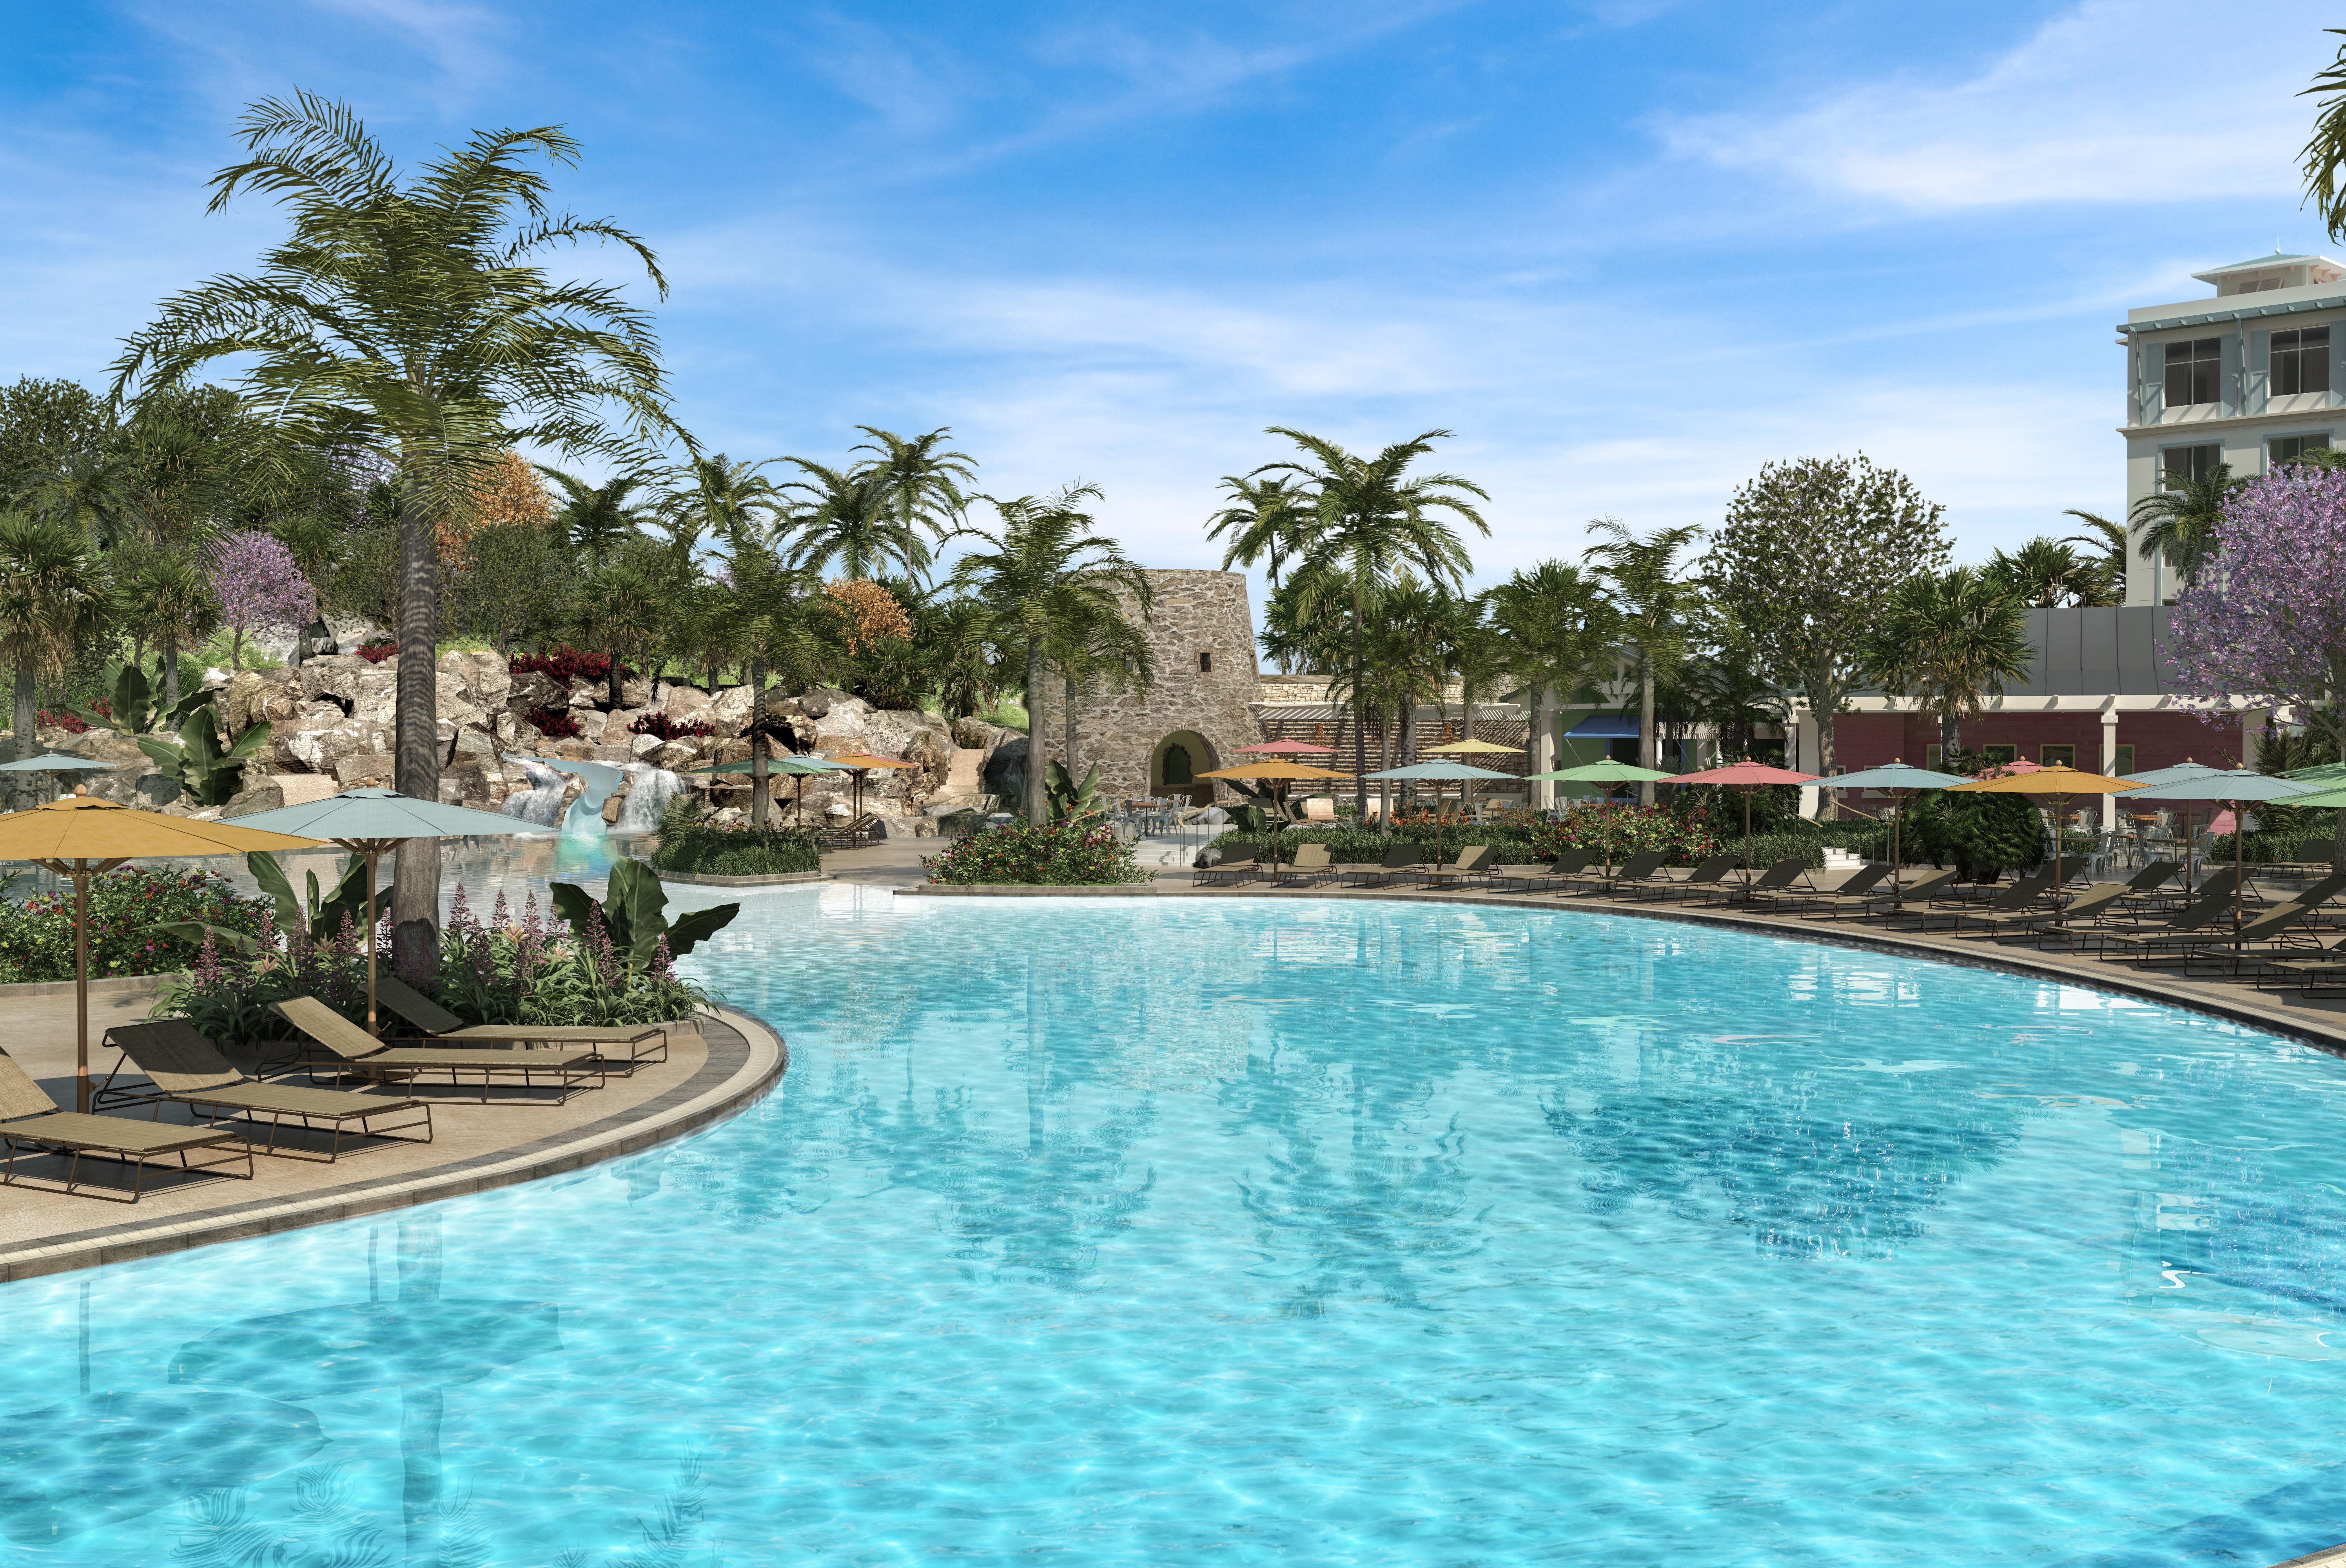 The Floridian Caribbean — Loews Sapphire Falls Resort